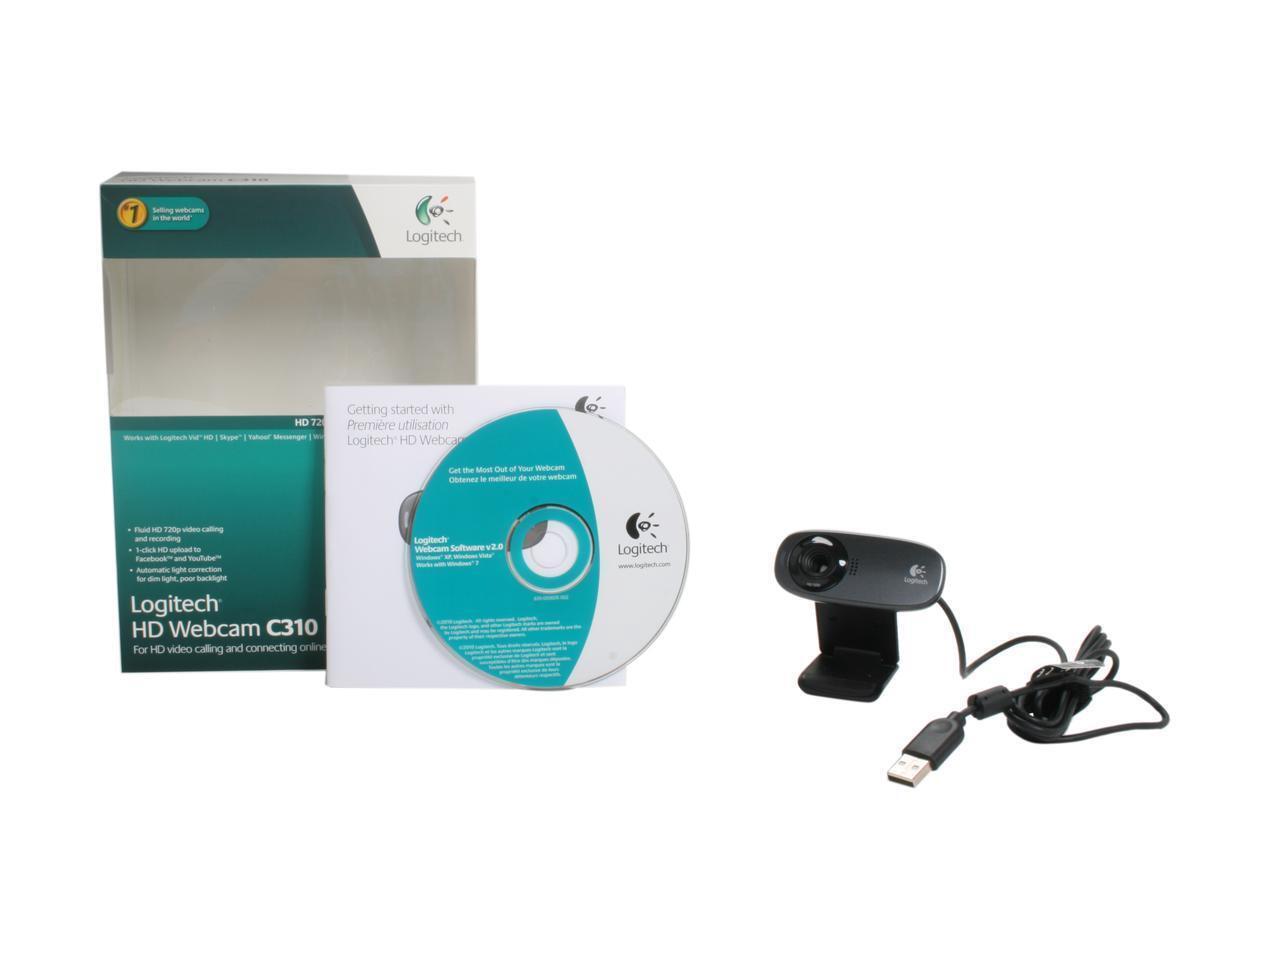 Logitech C310 Web Cam 97855067272 | eBay